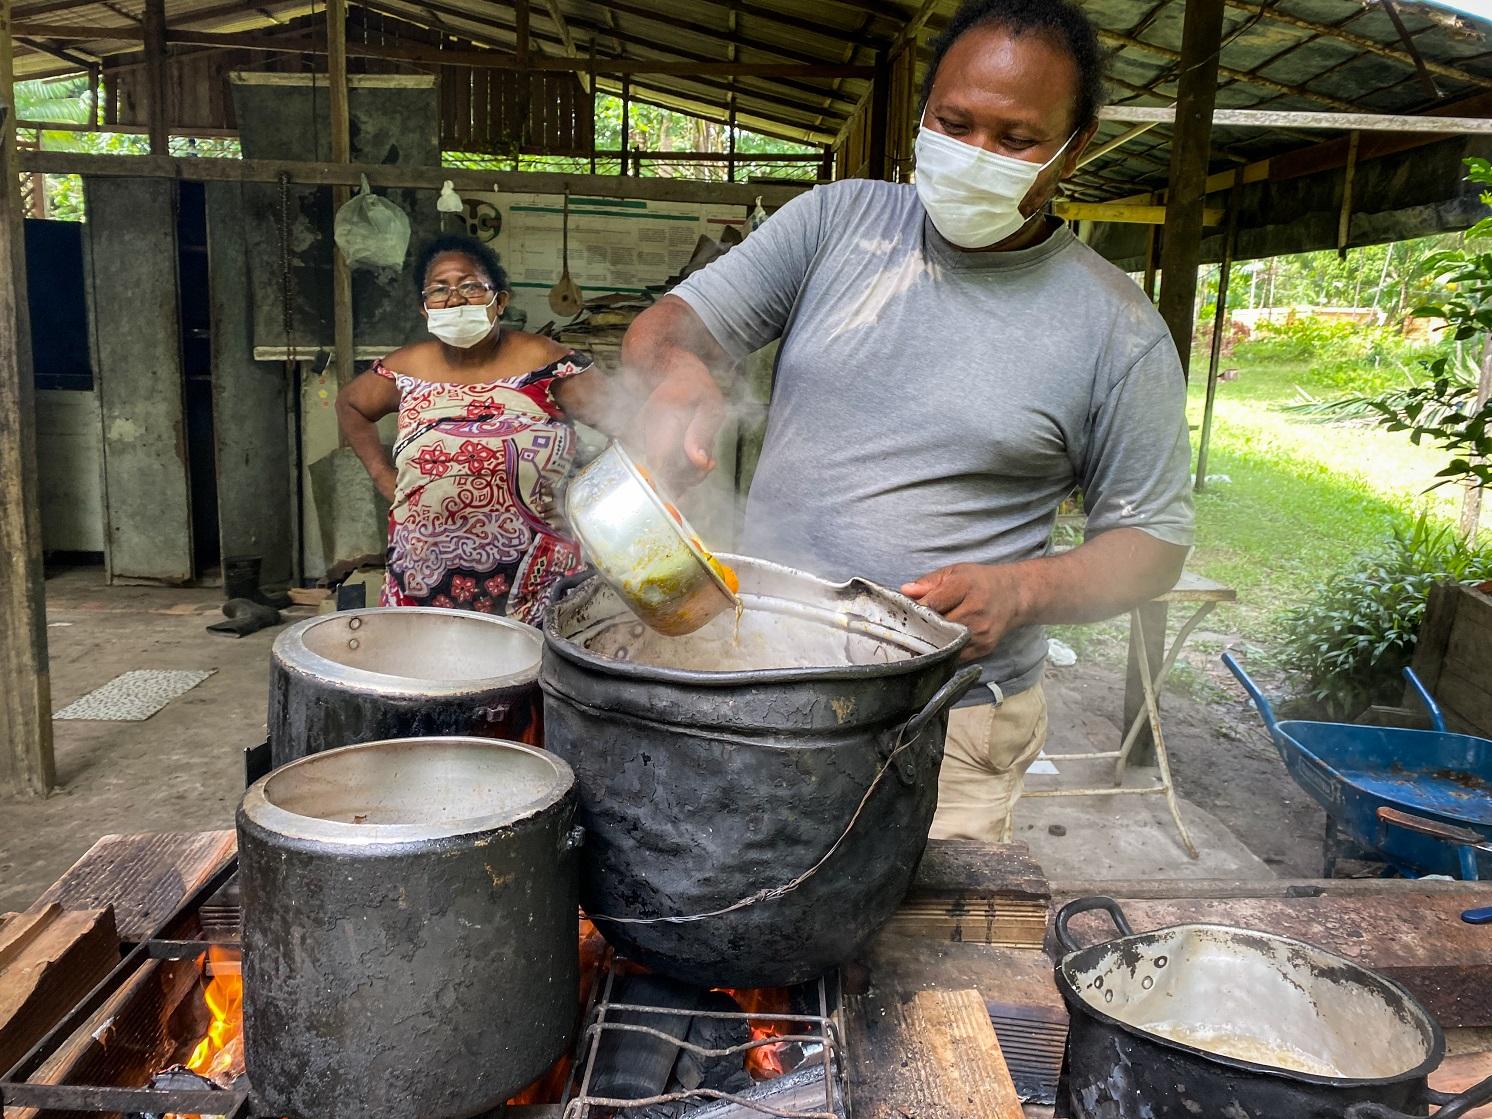 Wearing a medical mask, Raimundo Magno cooks pupunhas.